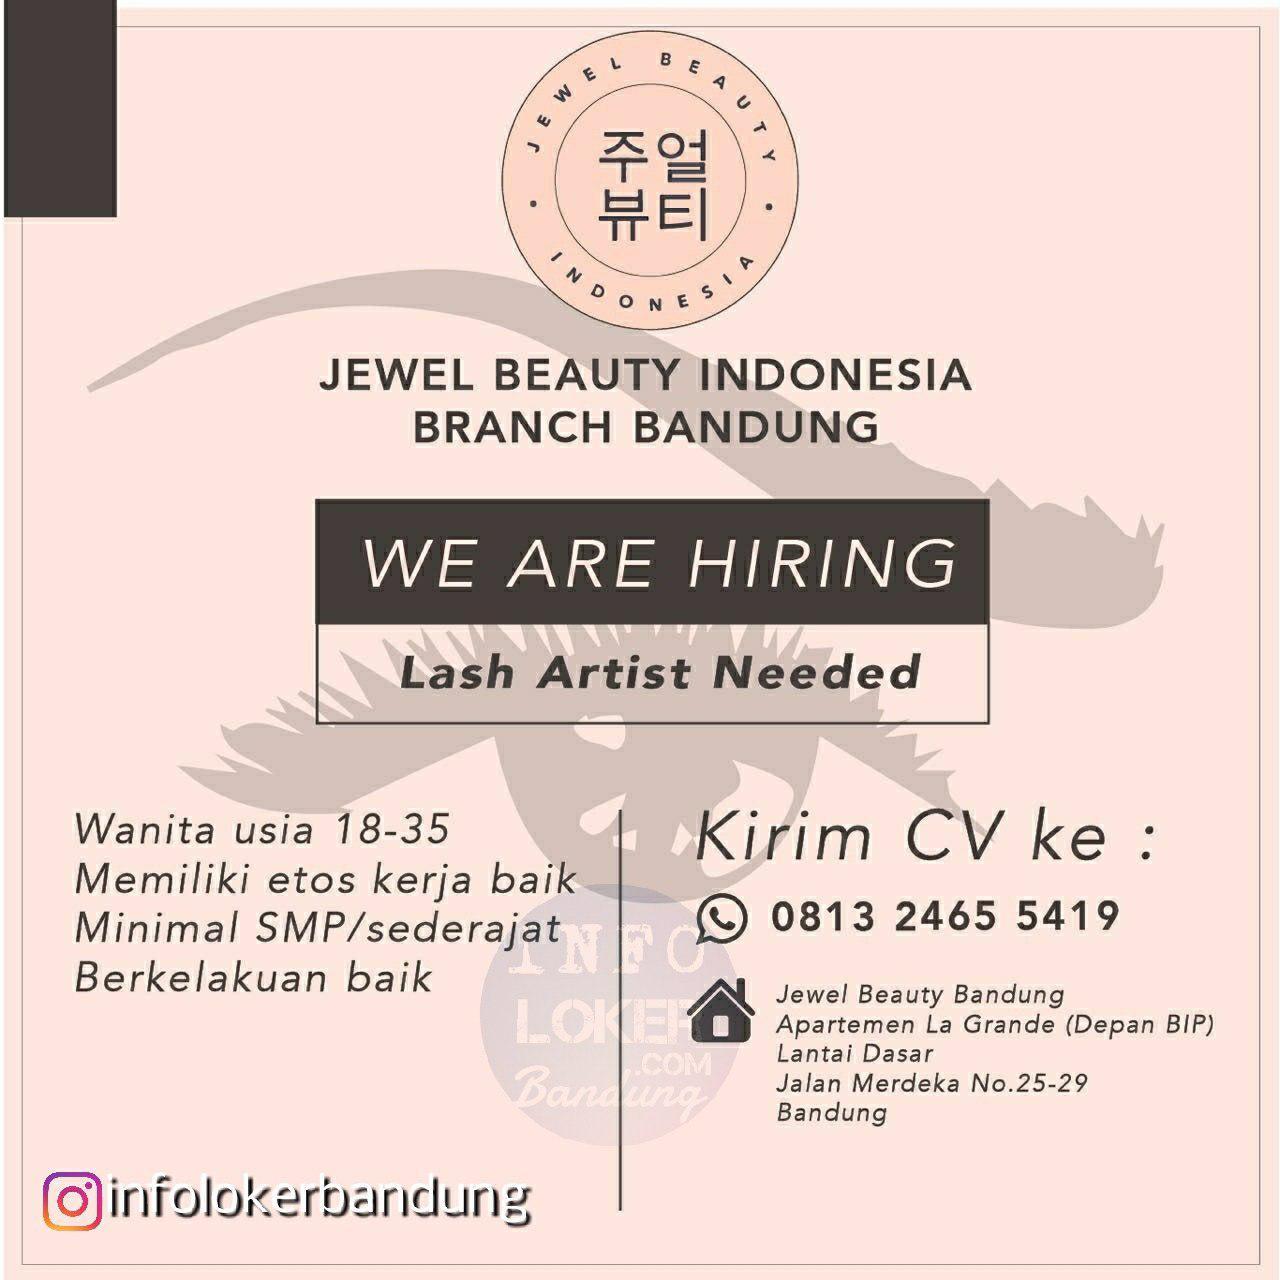 Lowongan Kerja Jewel Beauty Indonesia Bandung Agustus 2018